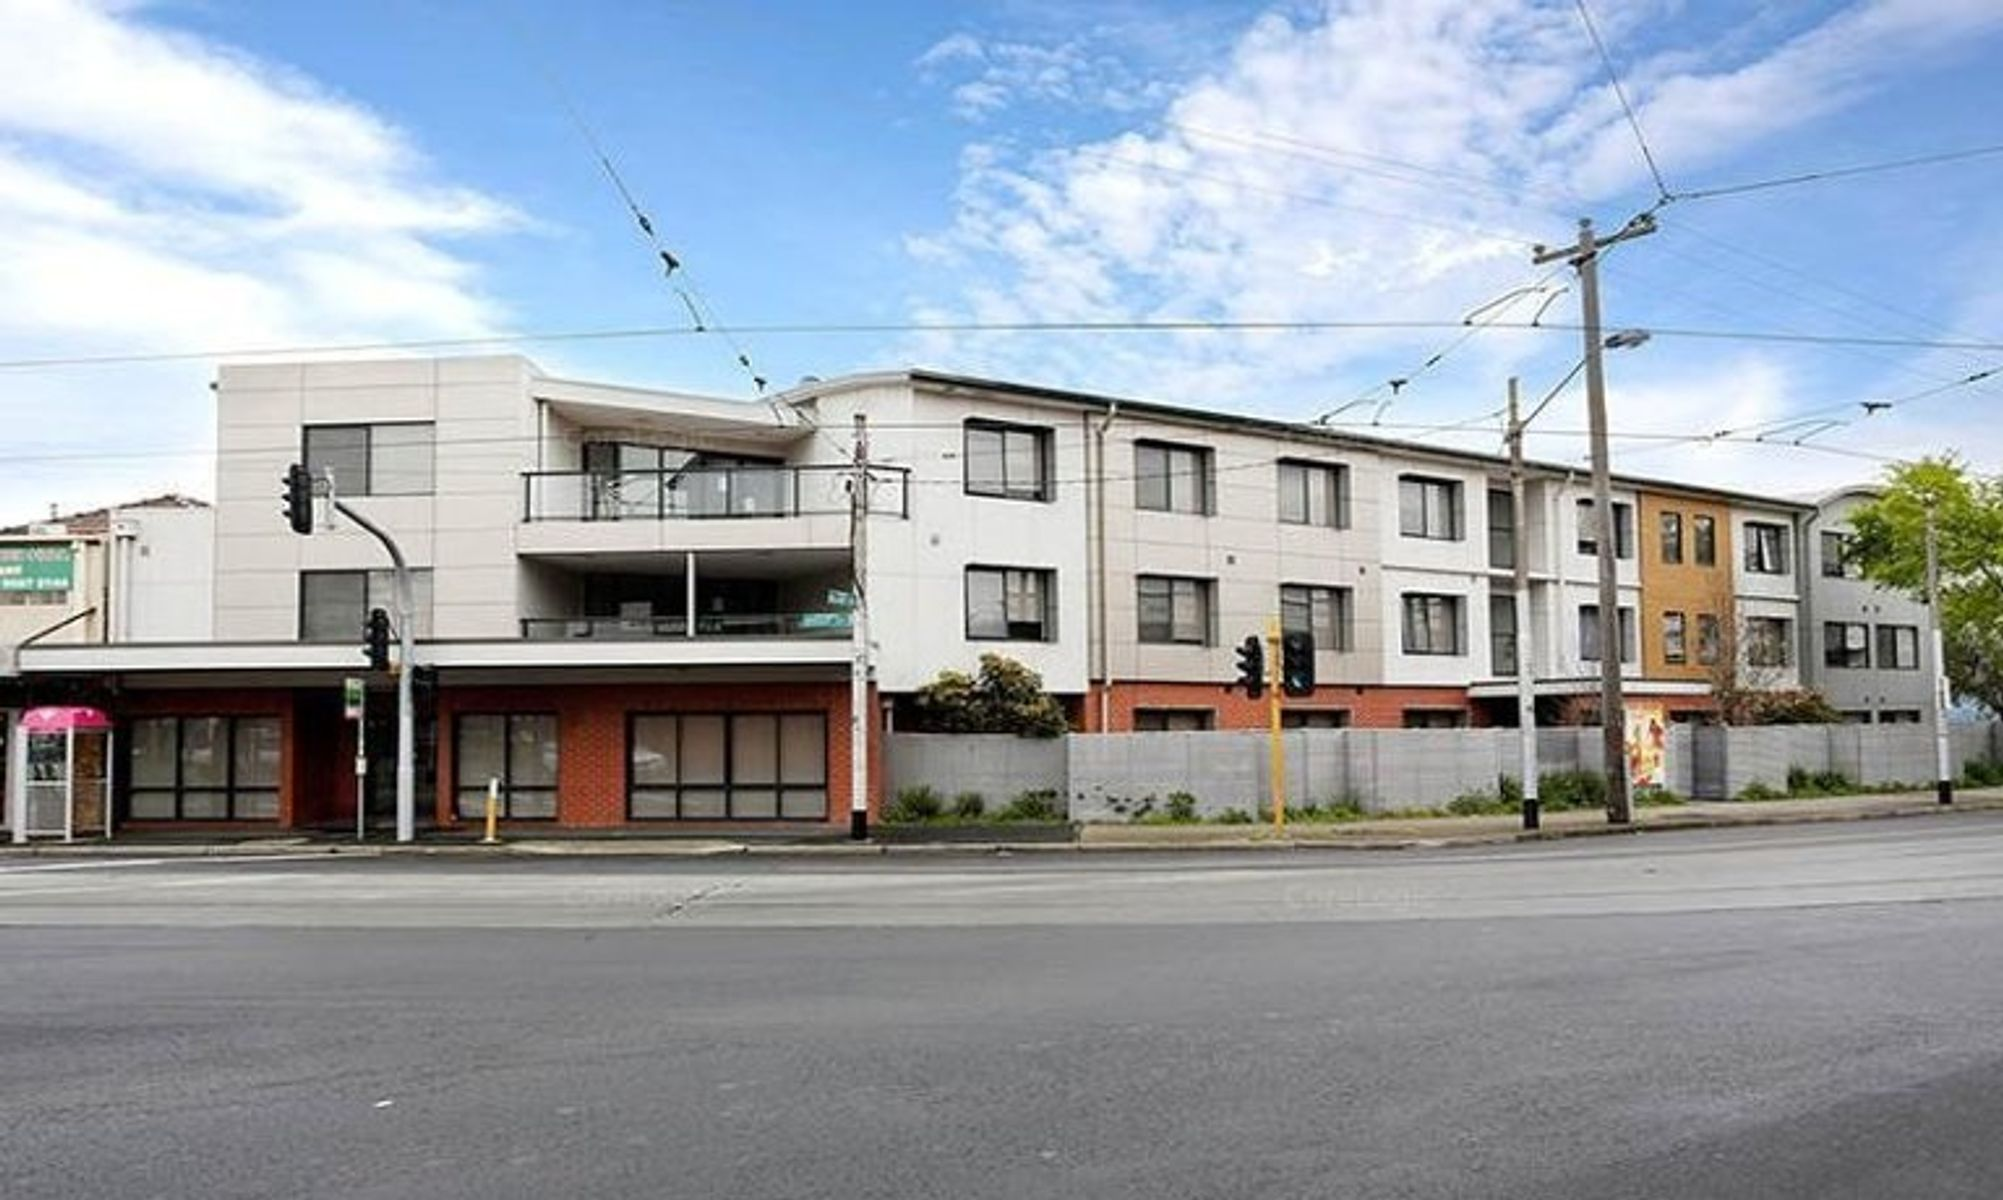 311/133 Droop Street, Footscray, VIC 3011